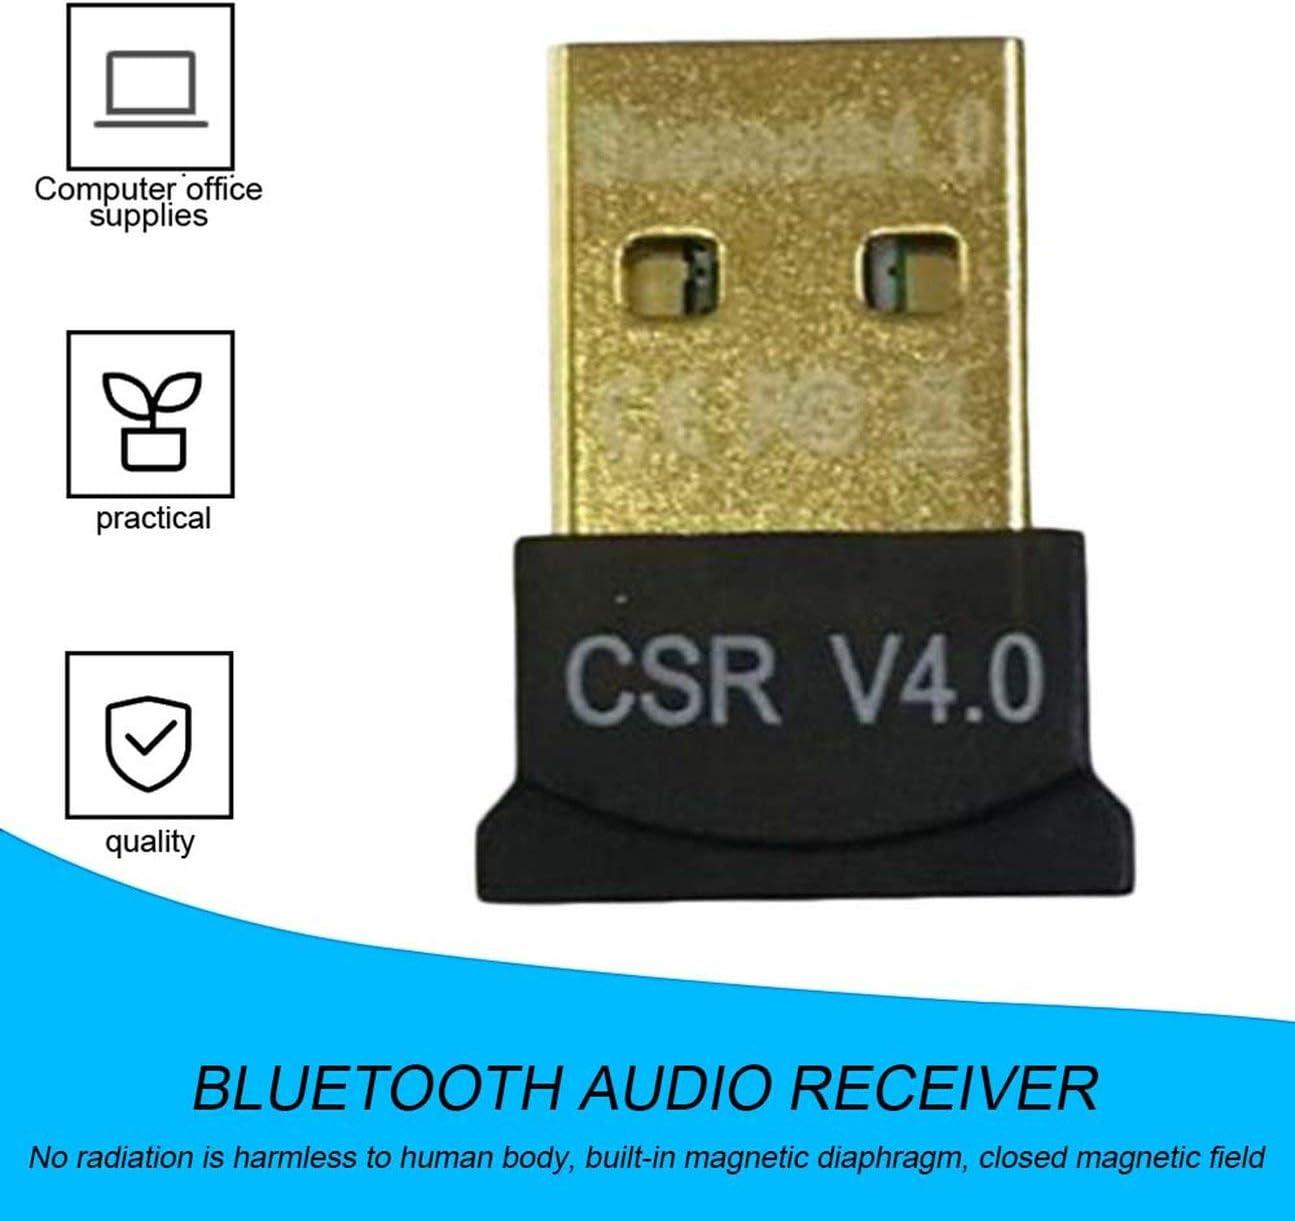 MachinYeser Mini USB Adaptador Bluetooth CSR Modo Dual Wireless Bluetooth V4.0 EDR Dongle Transmisor USB para Windows 7 8 10 PC portátil Negro